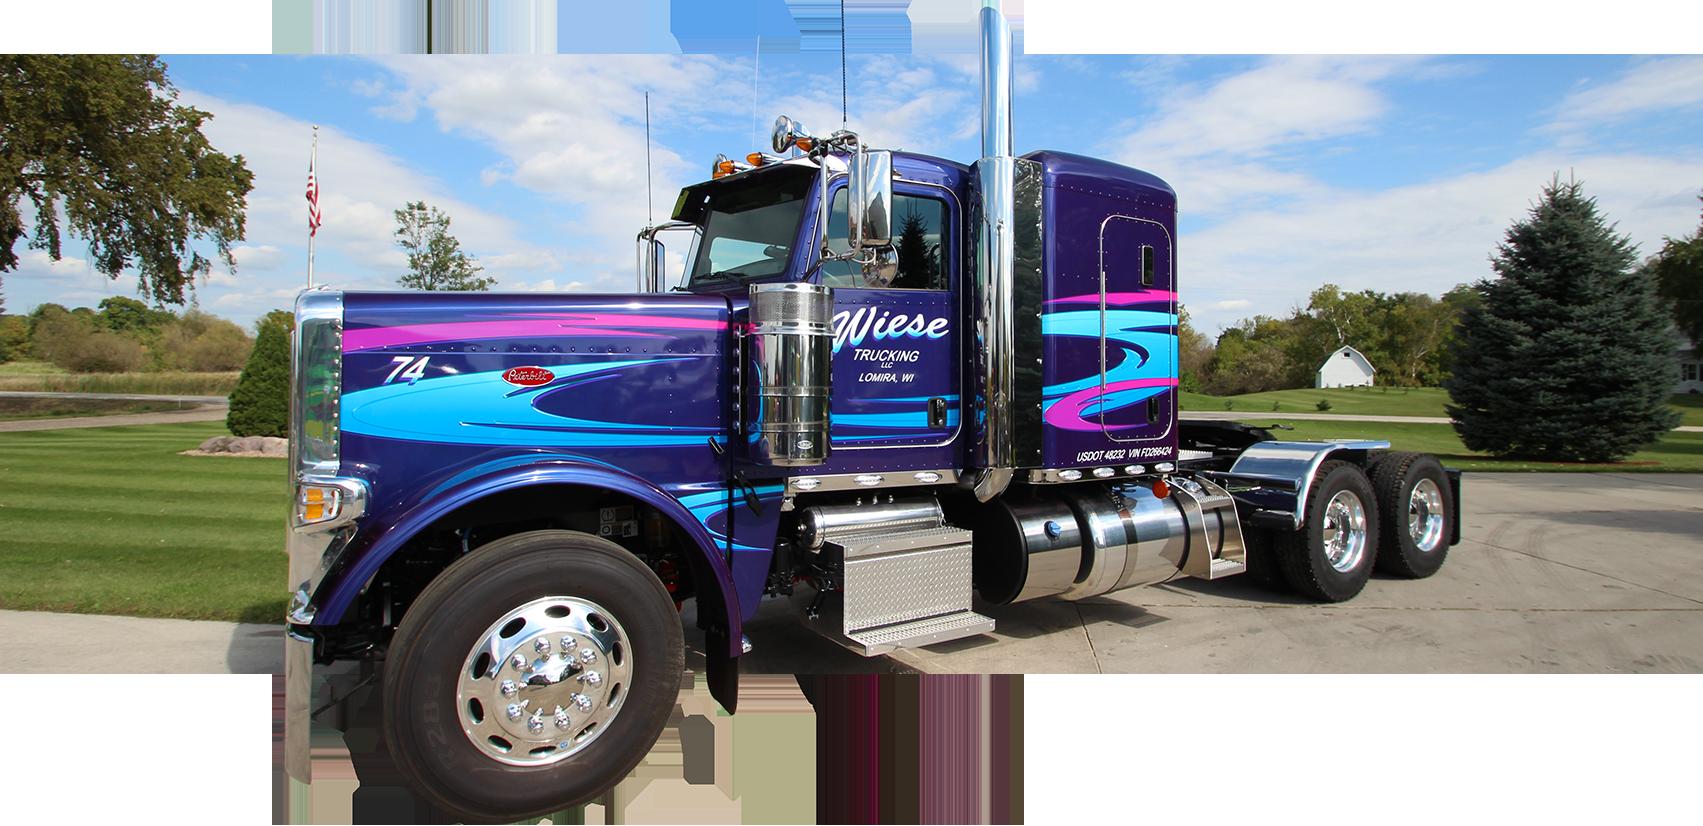 Wiese Trucking LLC vinyl semi truck lettering (Lomira, WI).